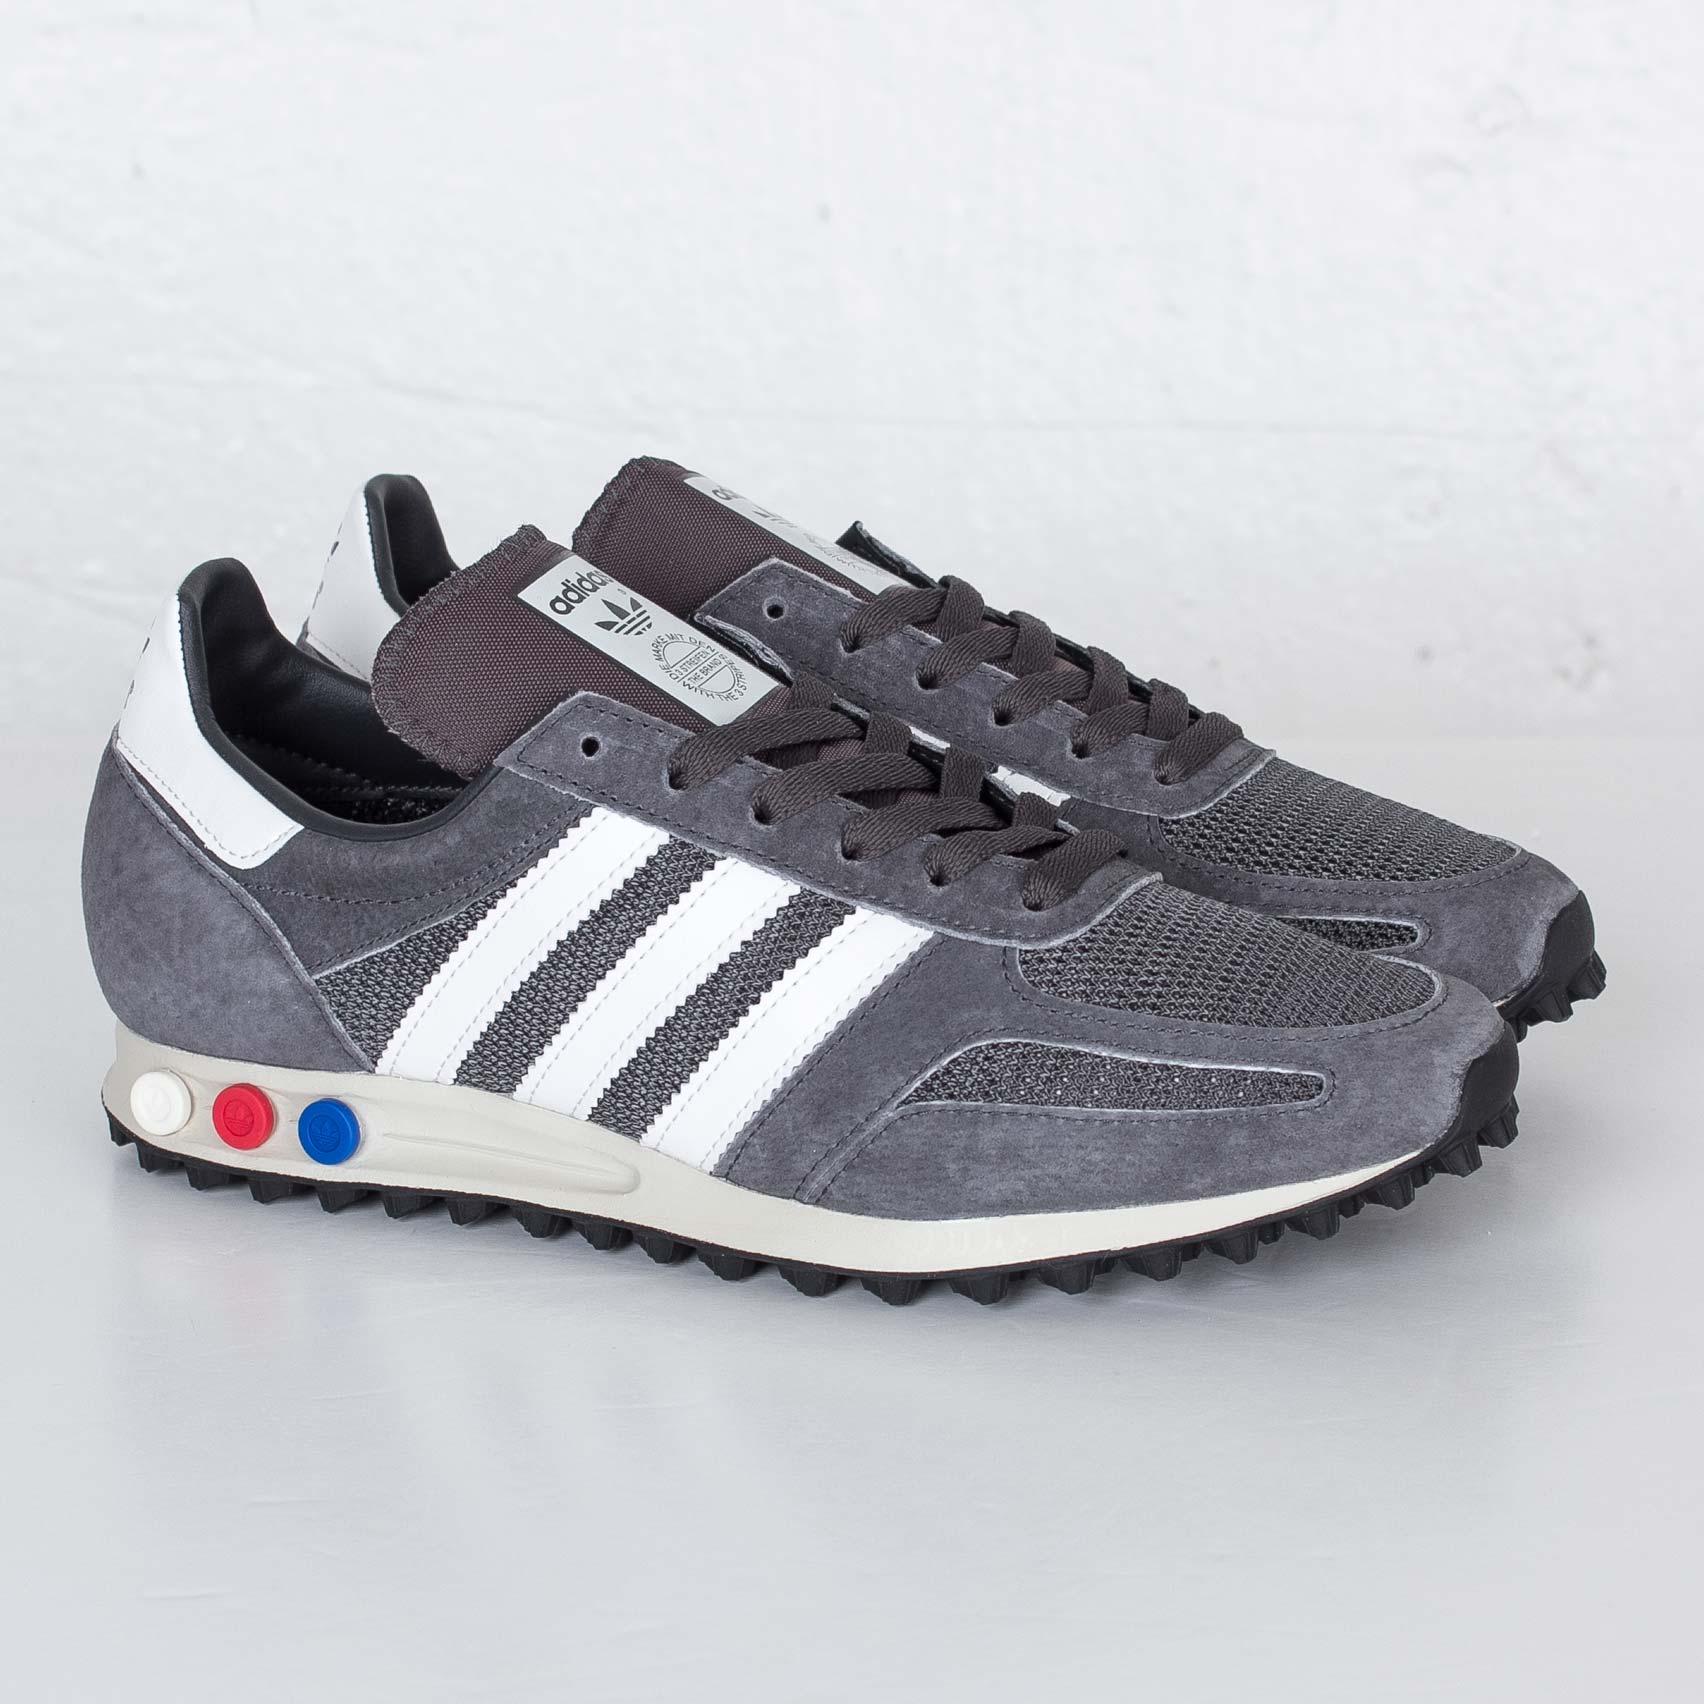 adidas adidas LA TRAINER OG AQ4928 sneakers grey Size